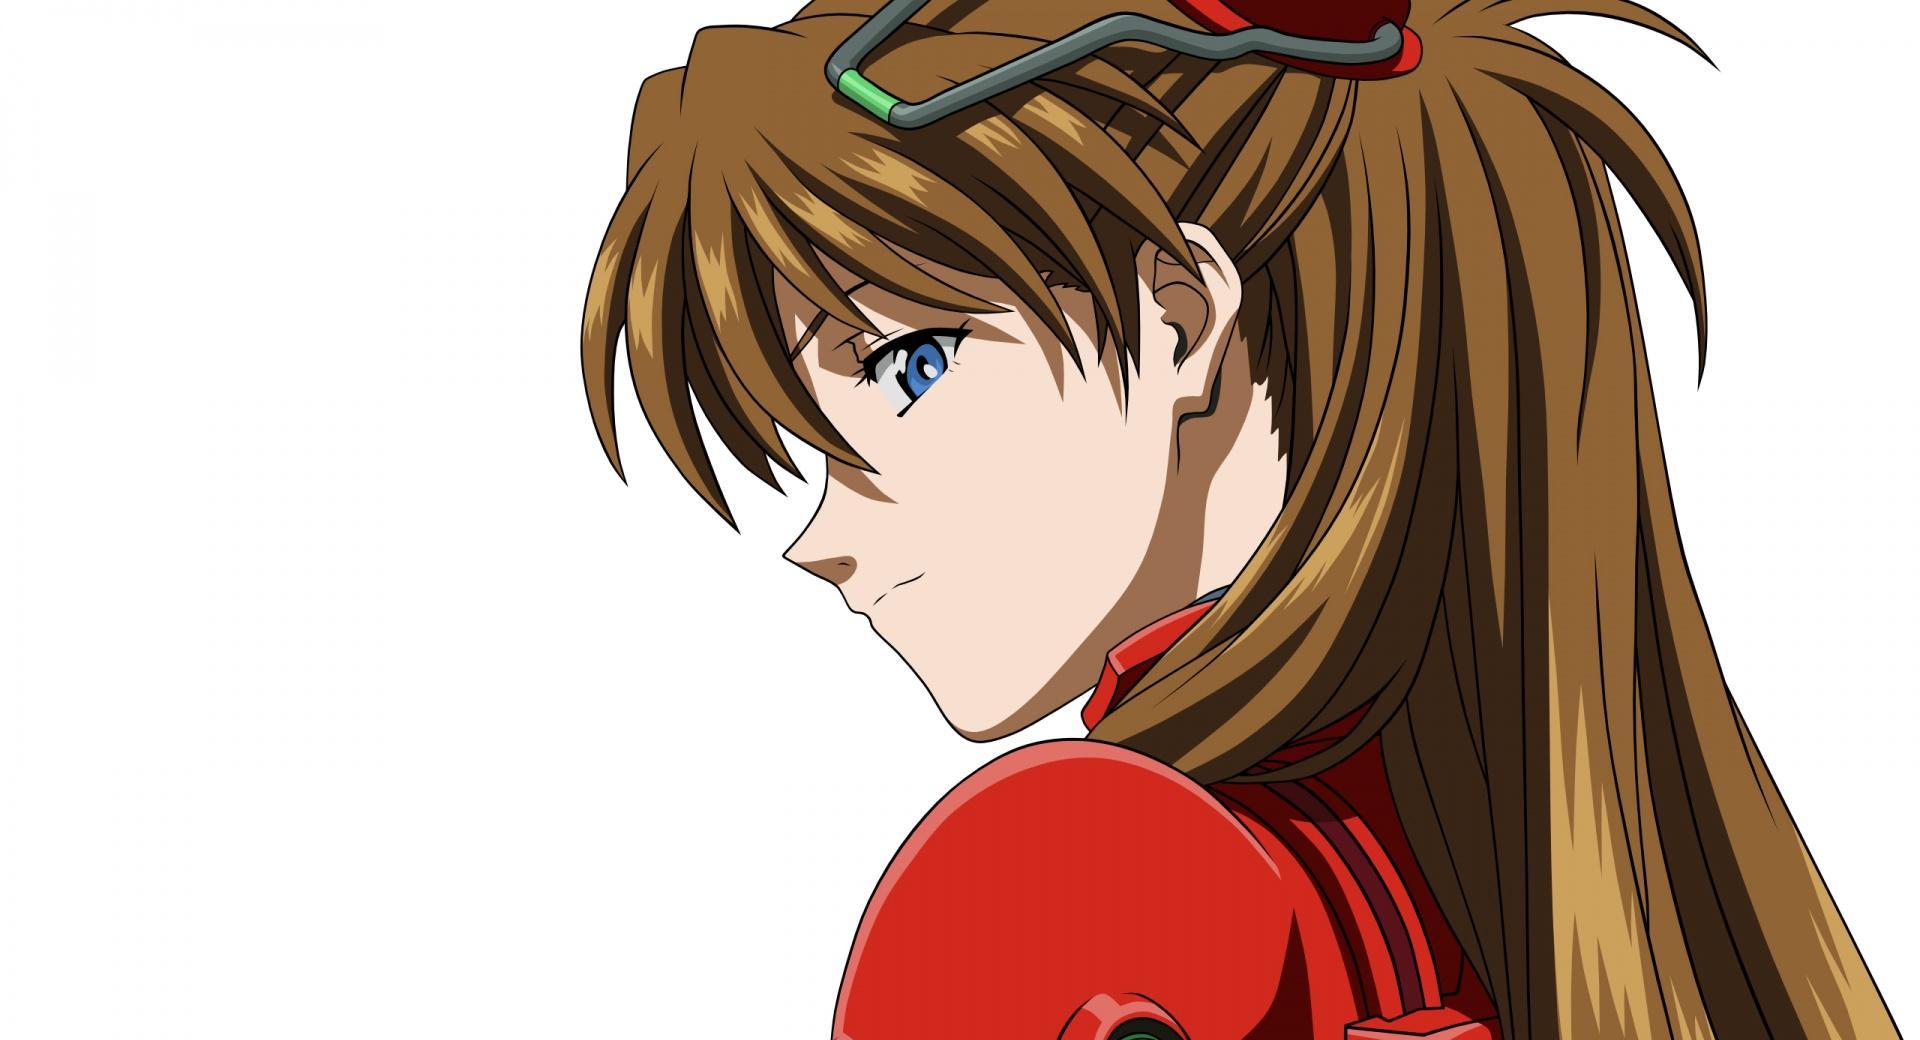 Neon Genesis Evangelion  Asuka Langley Soryu wallpapers HD quality